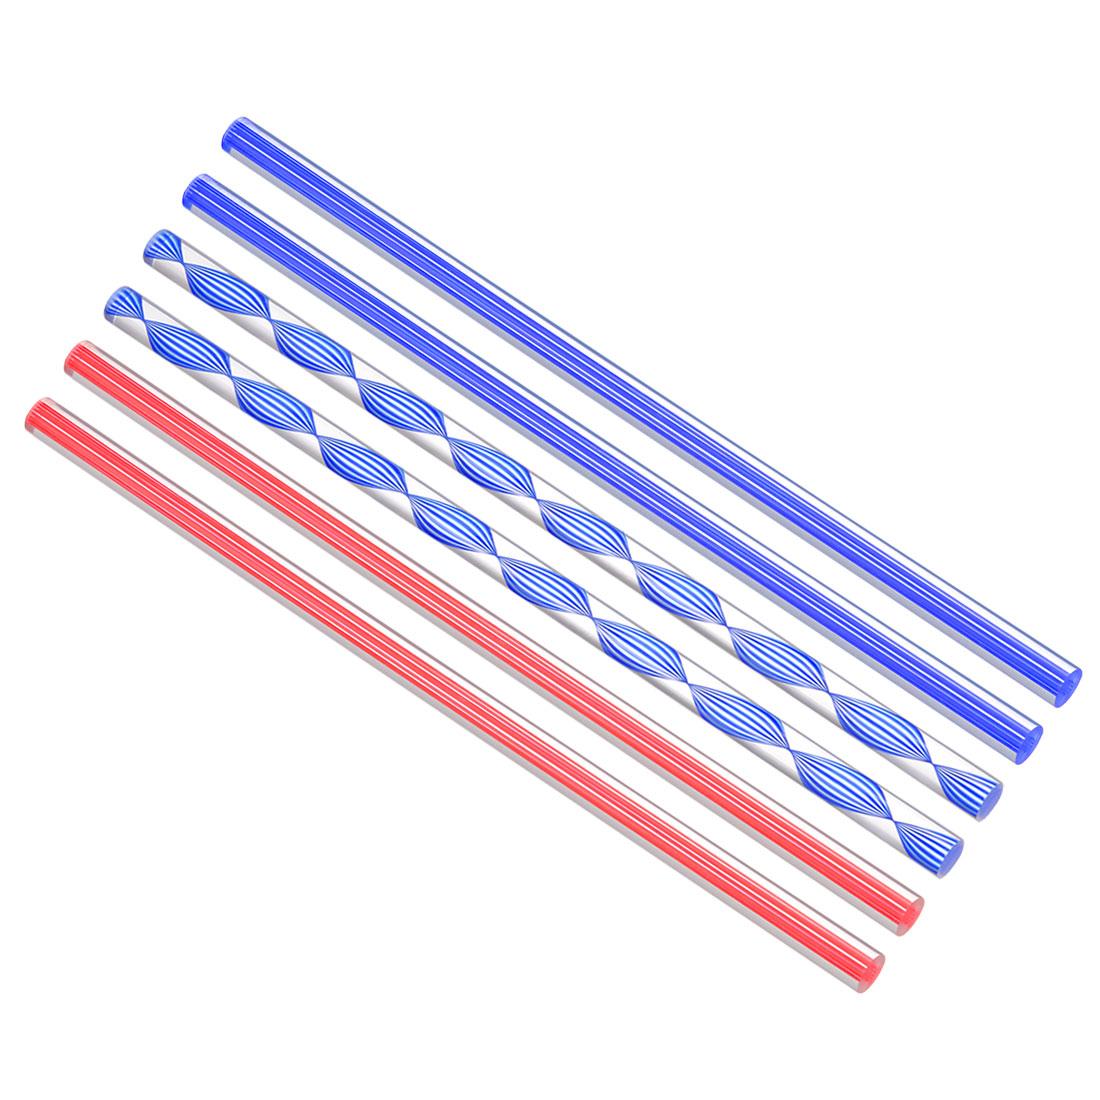 Solid Acrylic Round Rod Red Dark Blue Line PMMA Bar 10mmx250mm 6Pcs